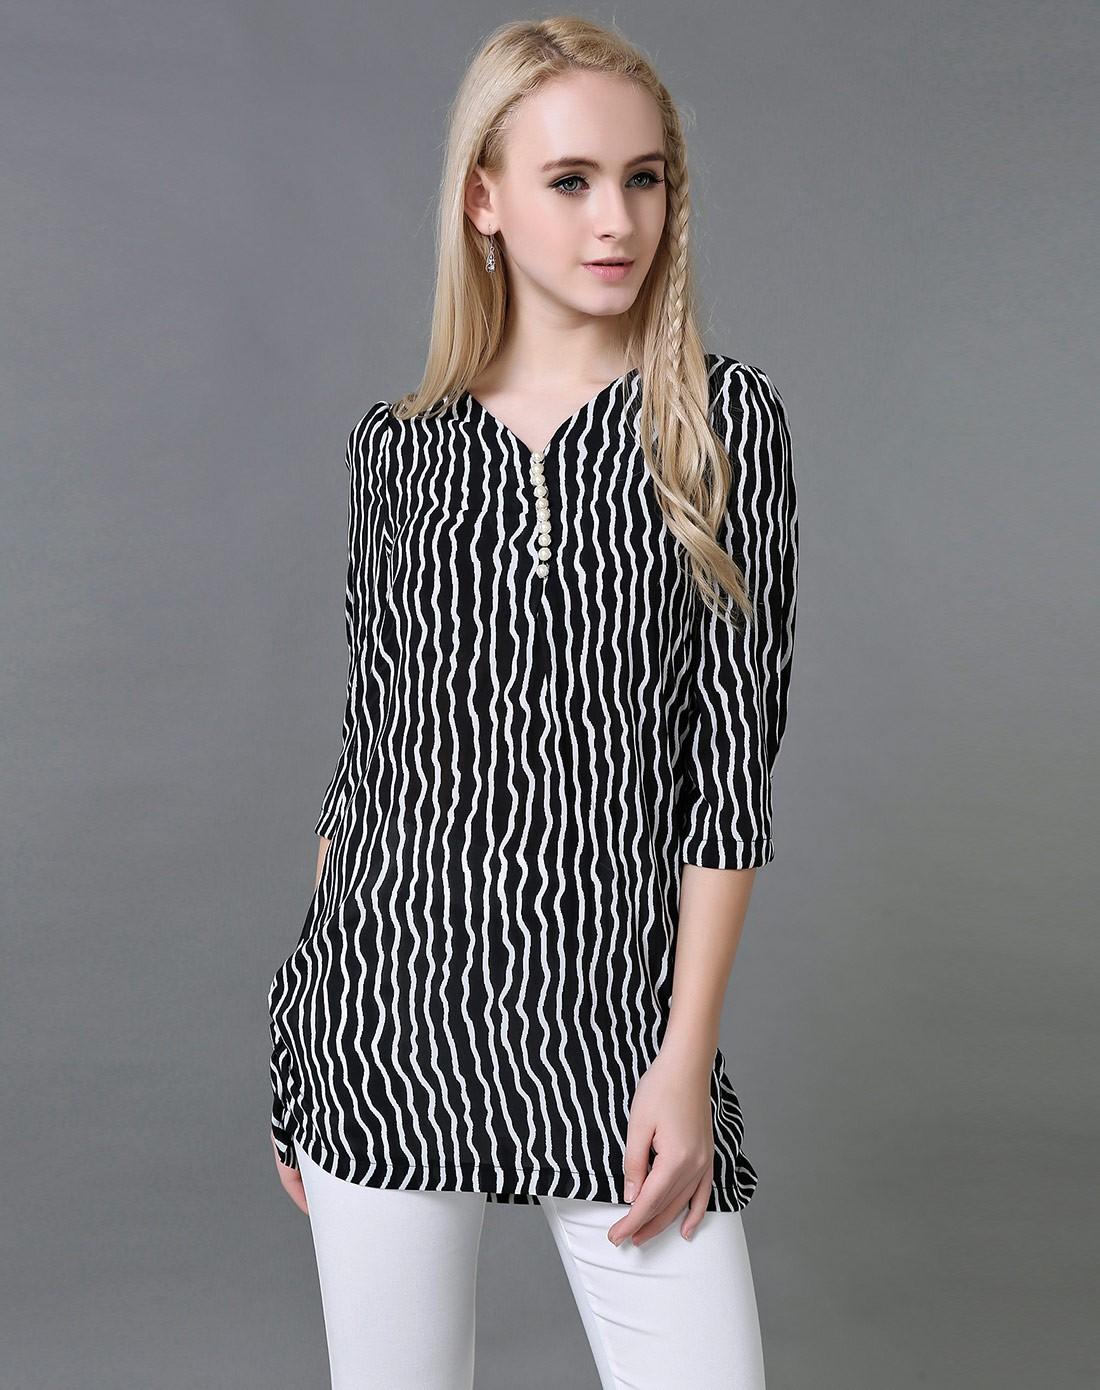 arango女款黑白色黑条纹上衣2g51y235880